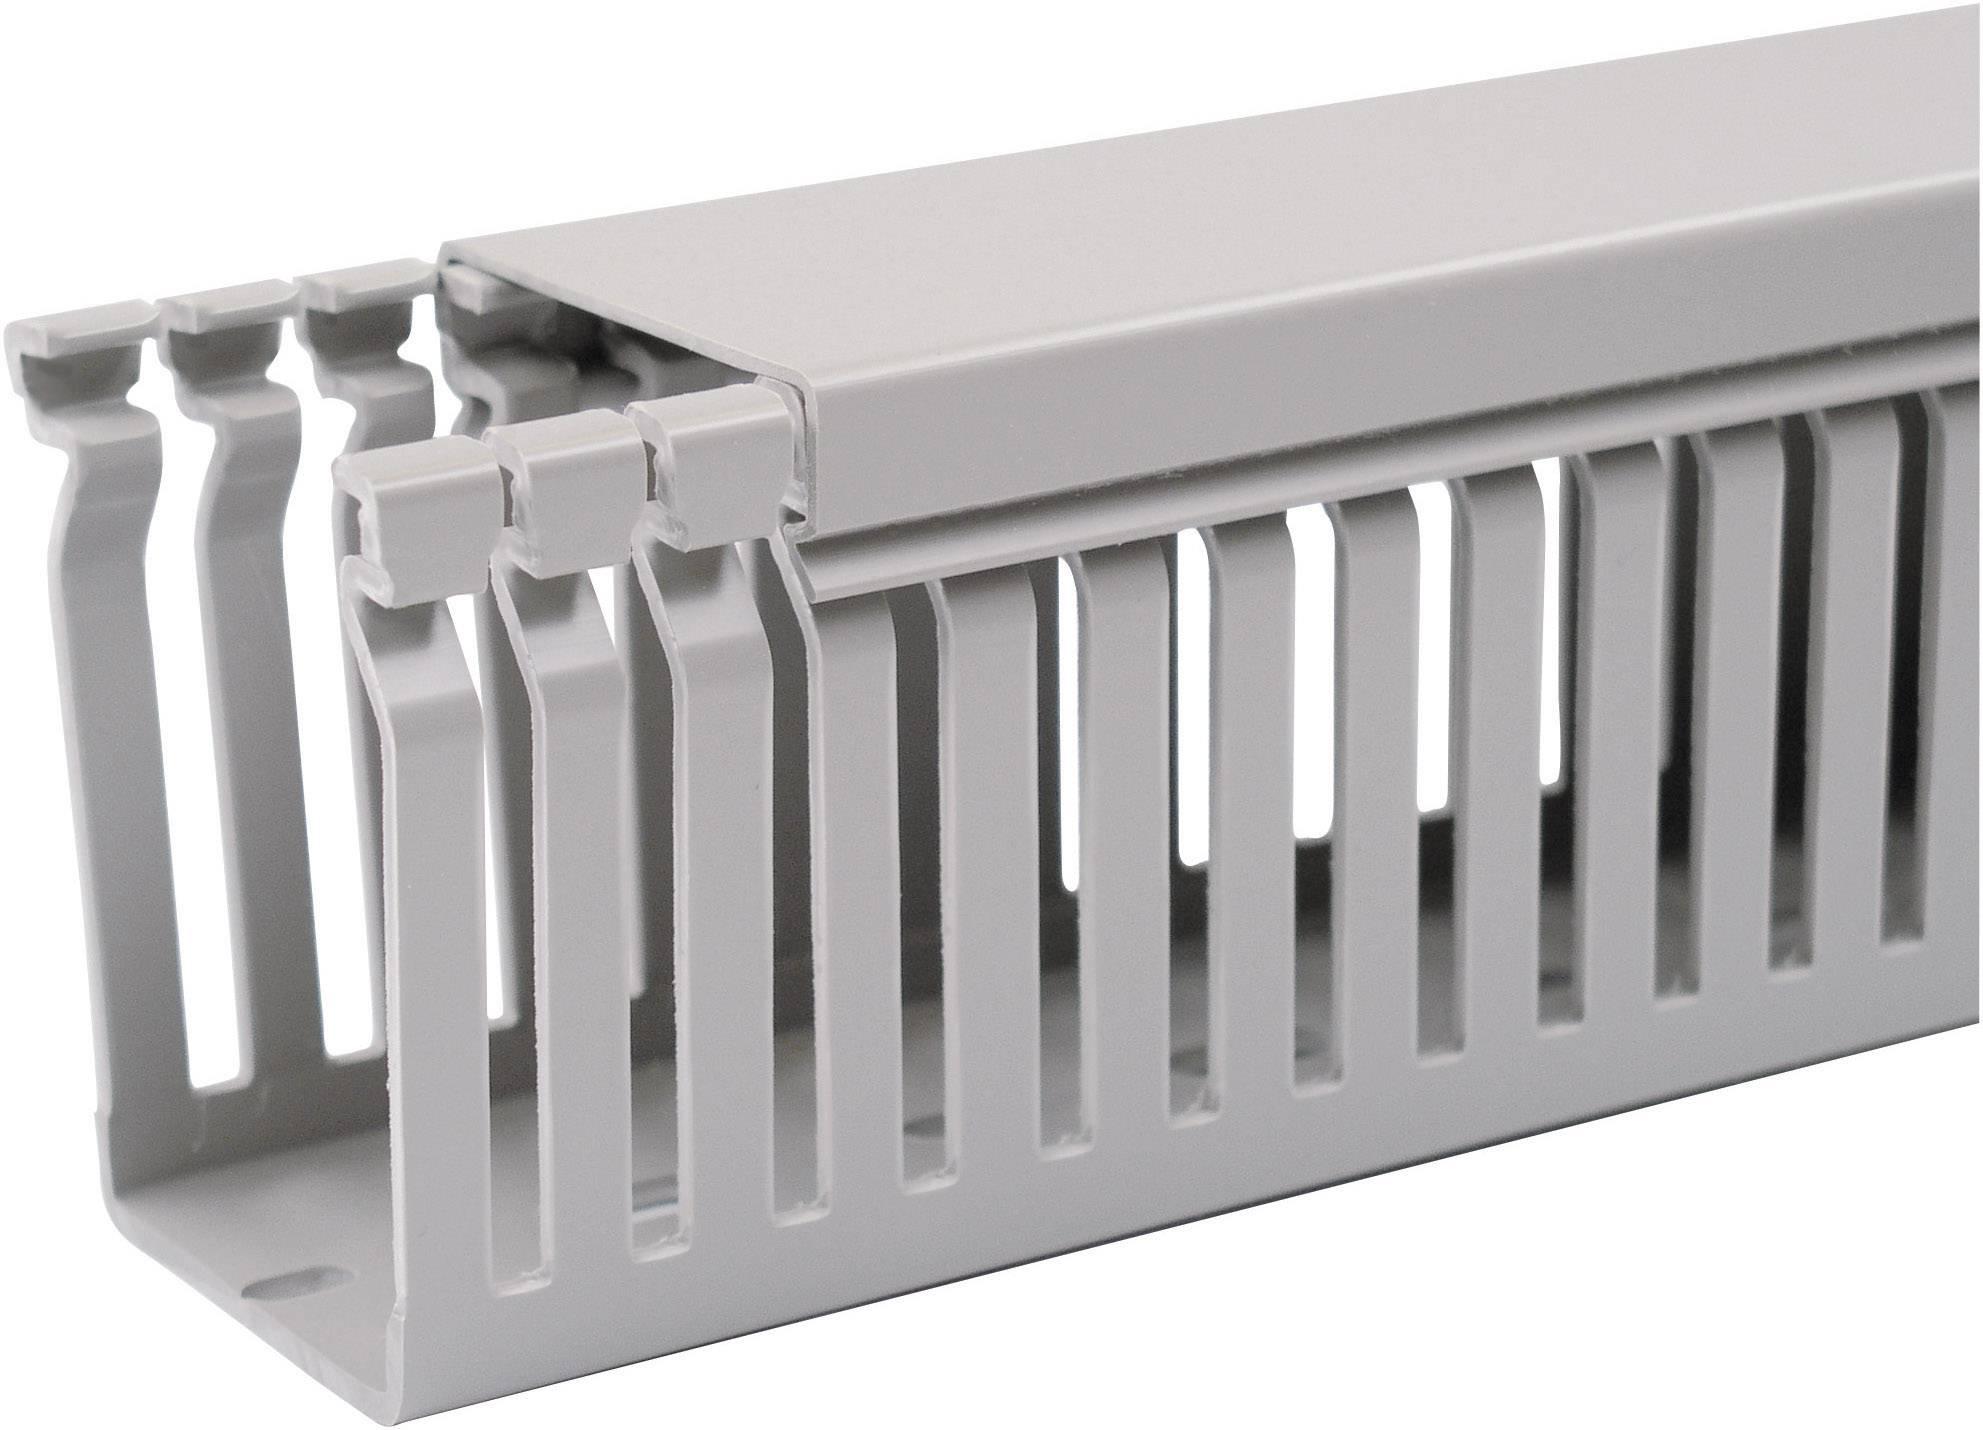 Elektroinstalační lišta OBO Bettermann, 6178014, 60x40 mm, 2 m, šedá